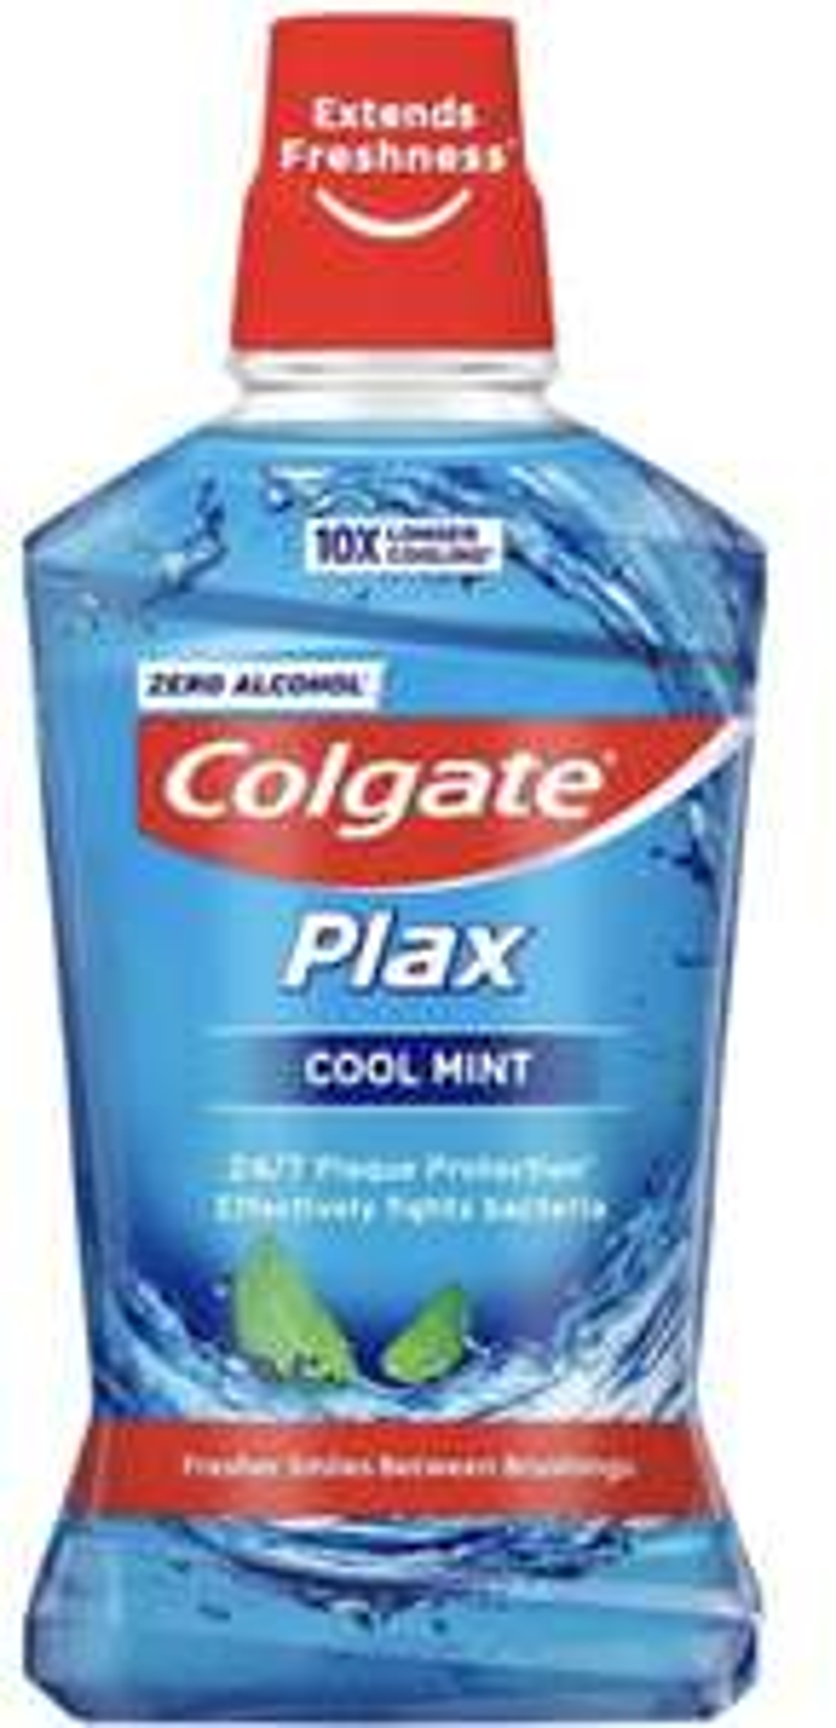 Colgate Plax Cool Mint Mouthwash with CPC 500ml £1.85 (+ £4.49 delivery nonprime) Amazon